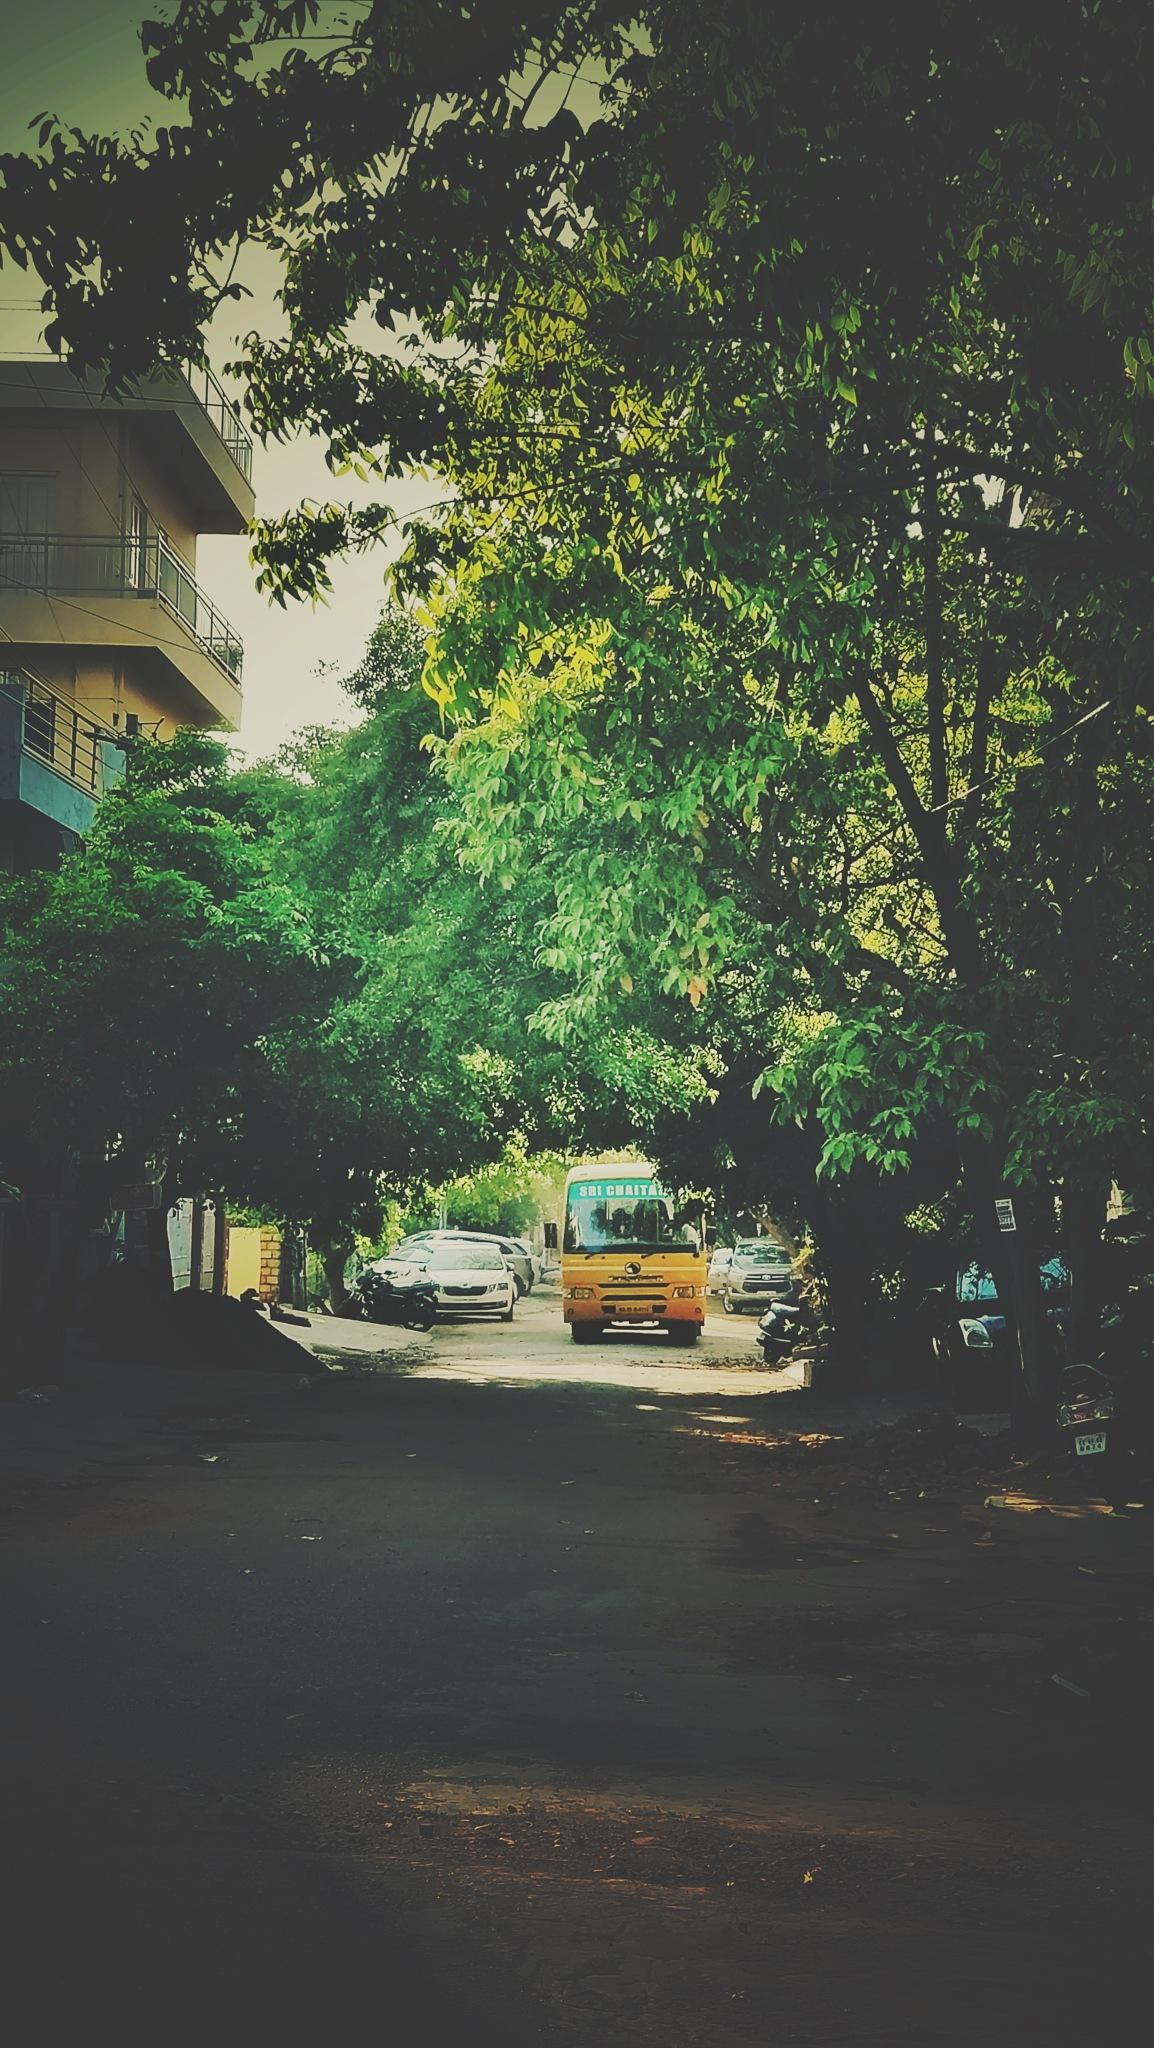 The school bus by DiKsha MiShra